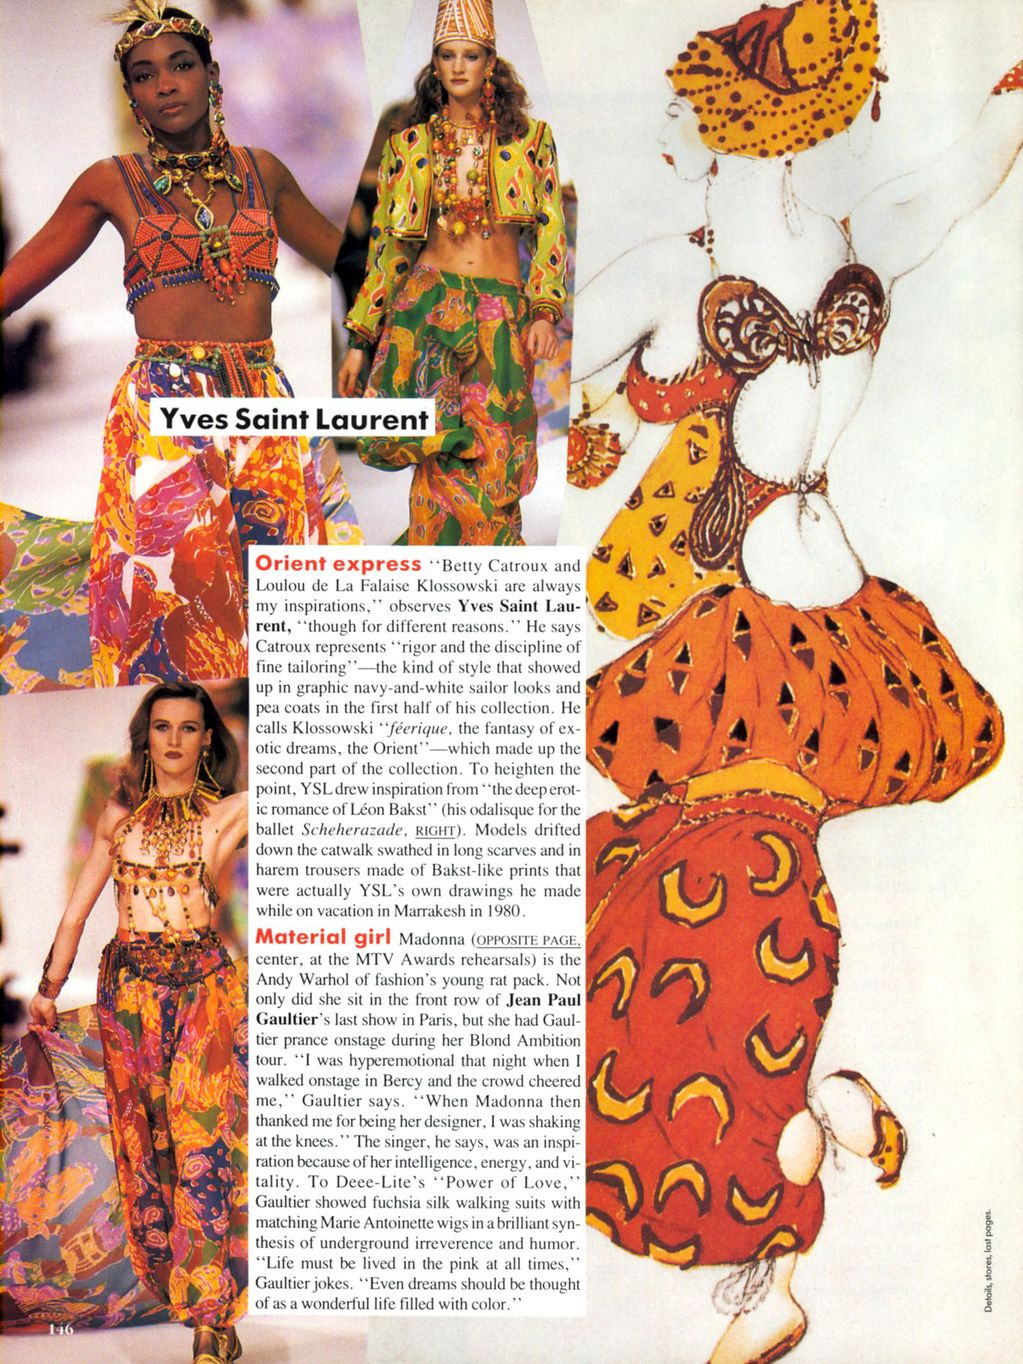 Vogue (US) January 1991 | Fashion 1991 15.jpg